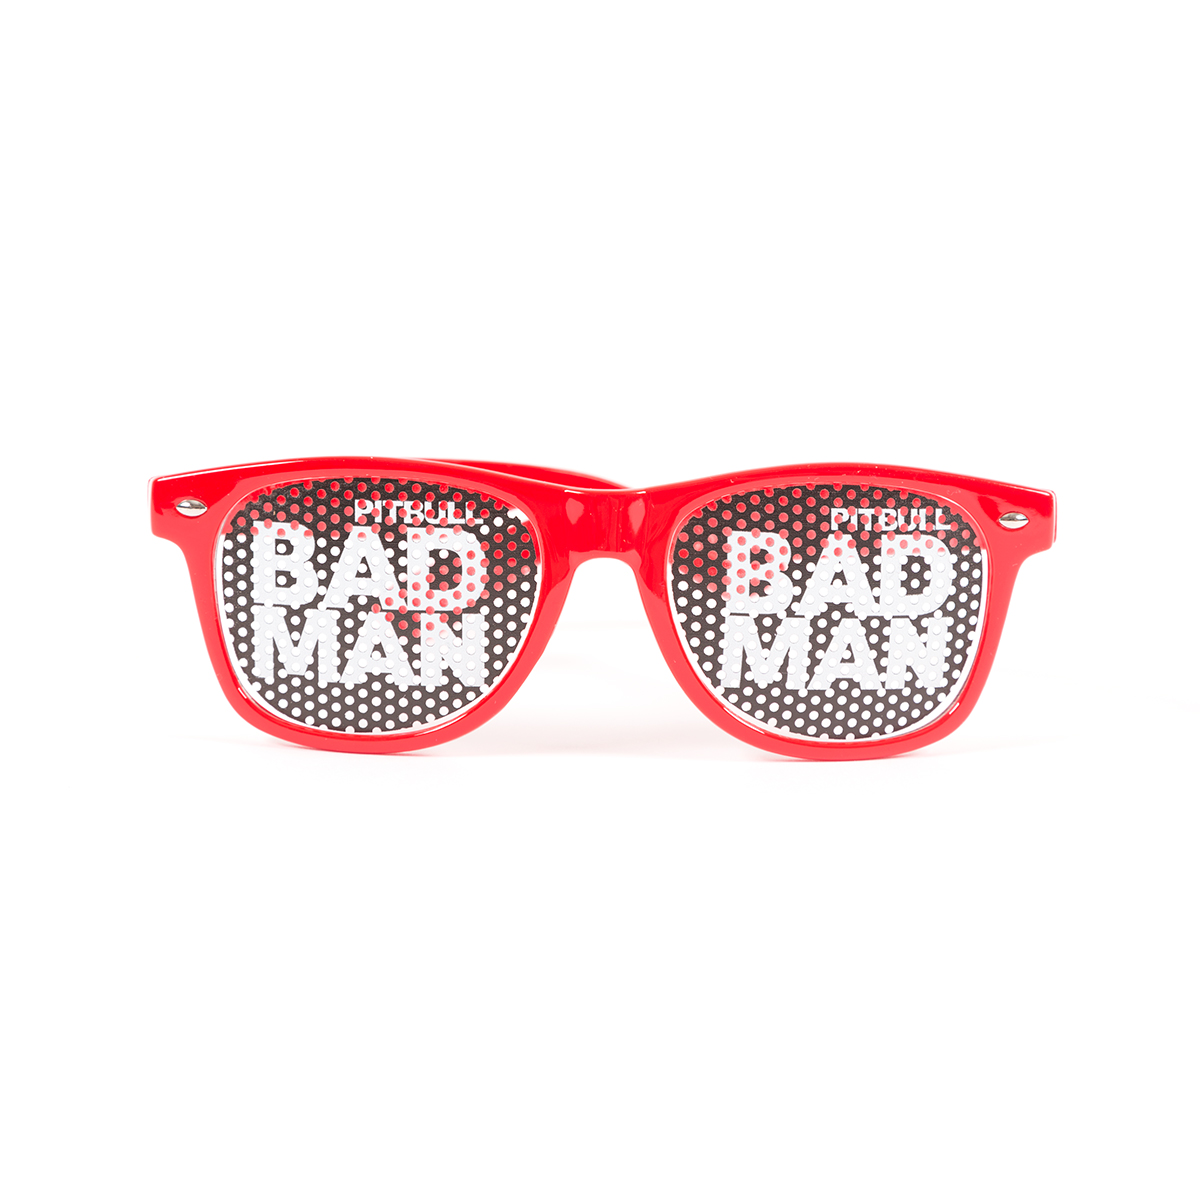 Pitbull Red Bad Man Sunglasses